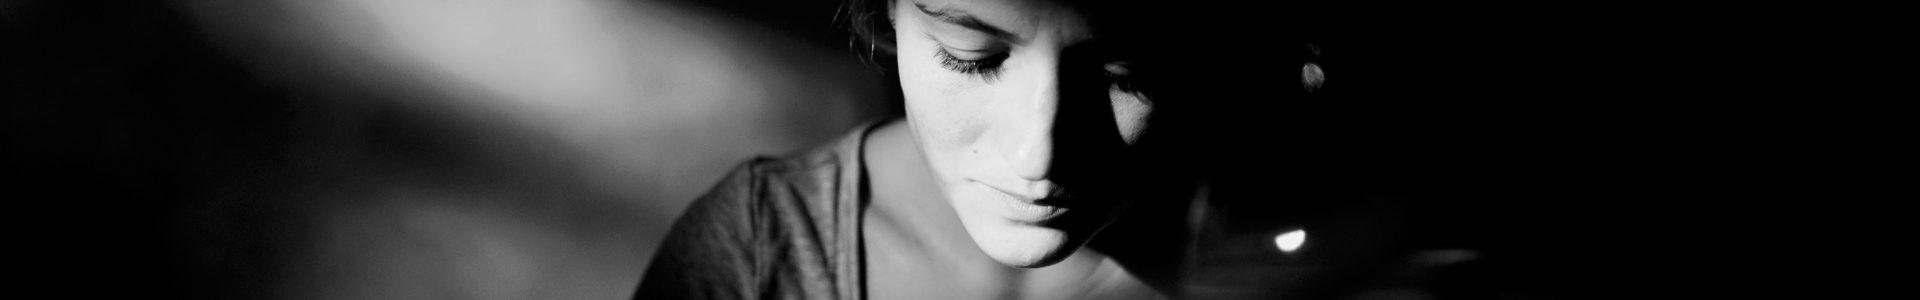 baja la ansiedad con alimentacion